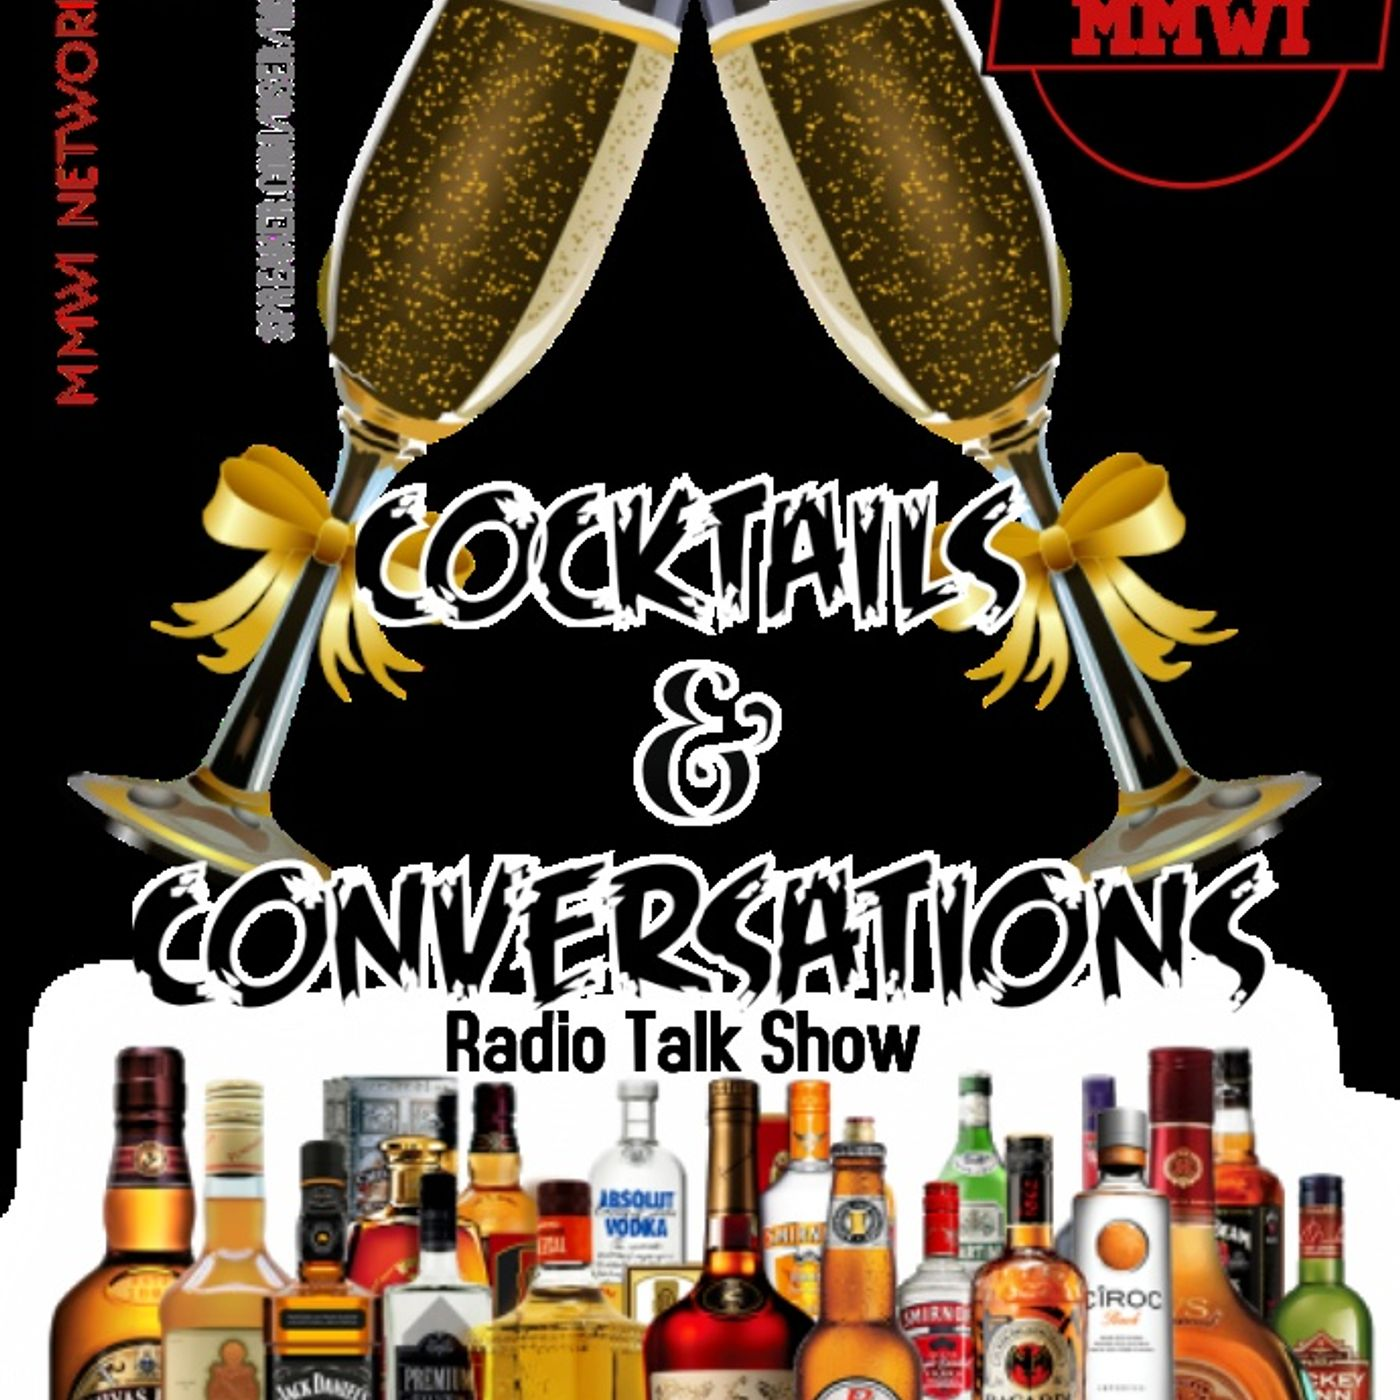 Cocktails & Conversations Radio Talk Show 8-28-2021